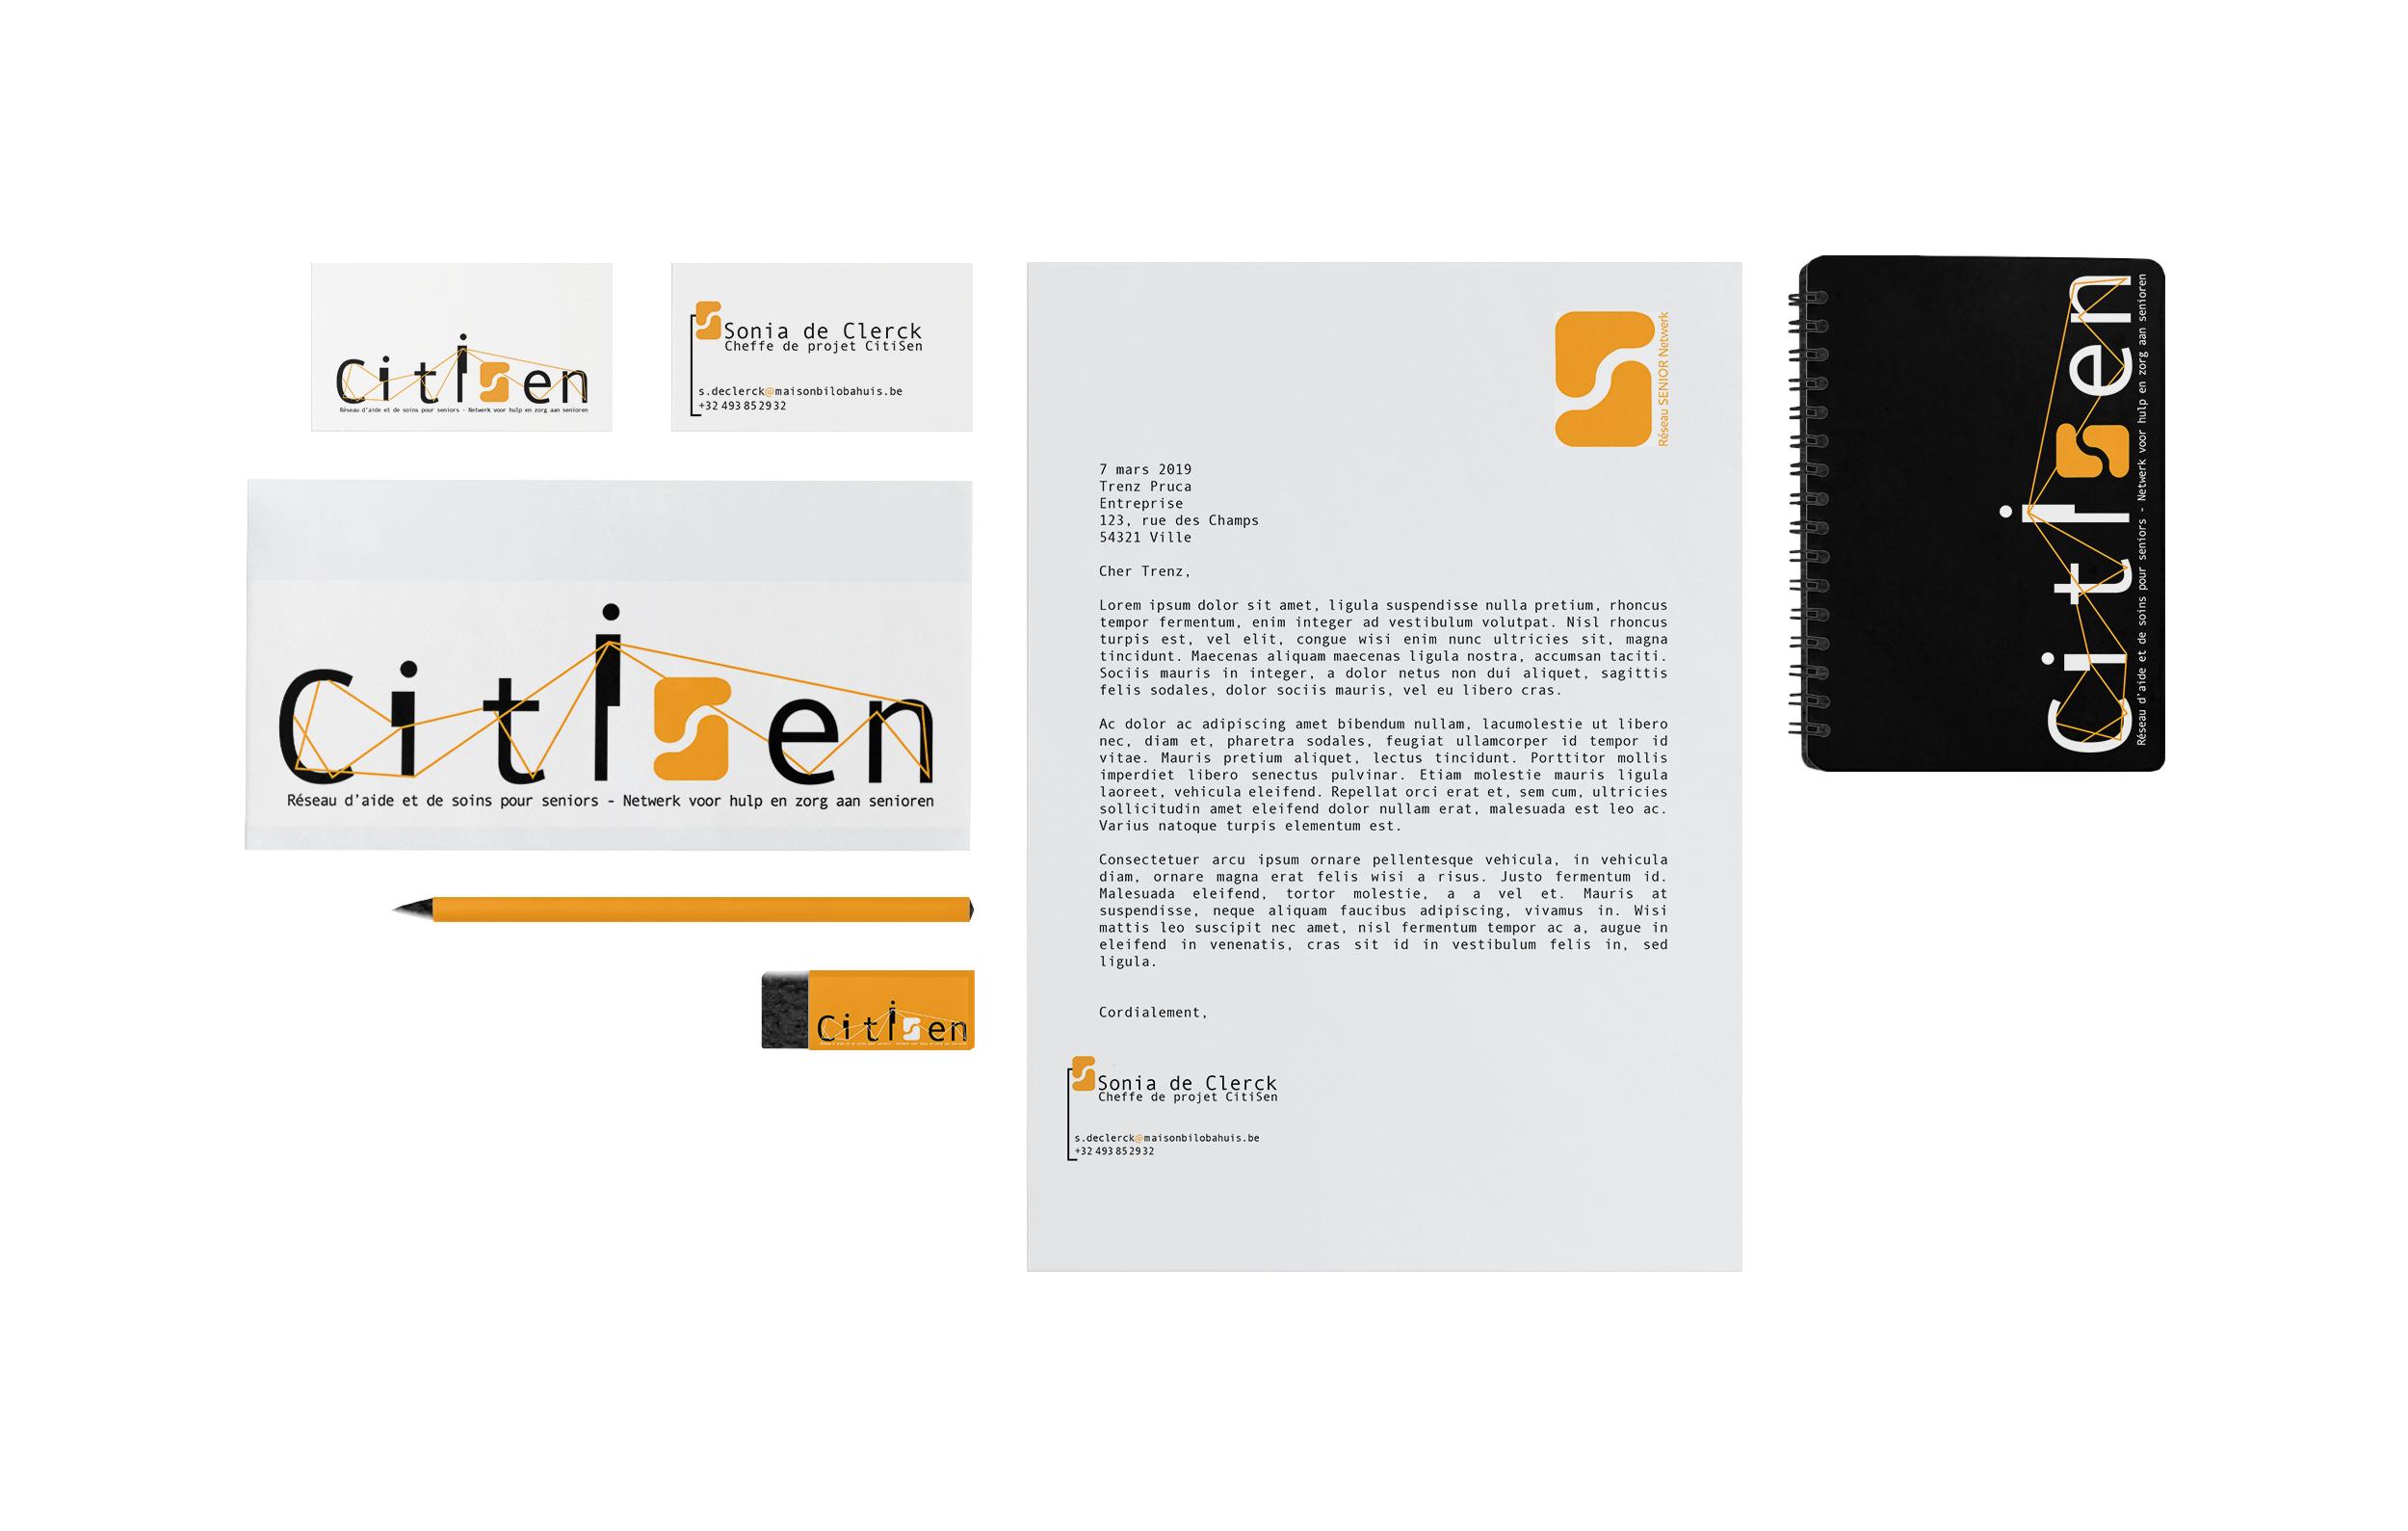 Stationnery - CitiSen (réseau senior)